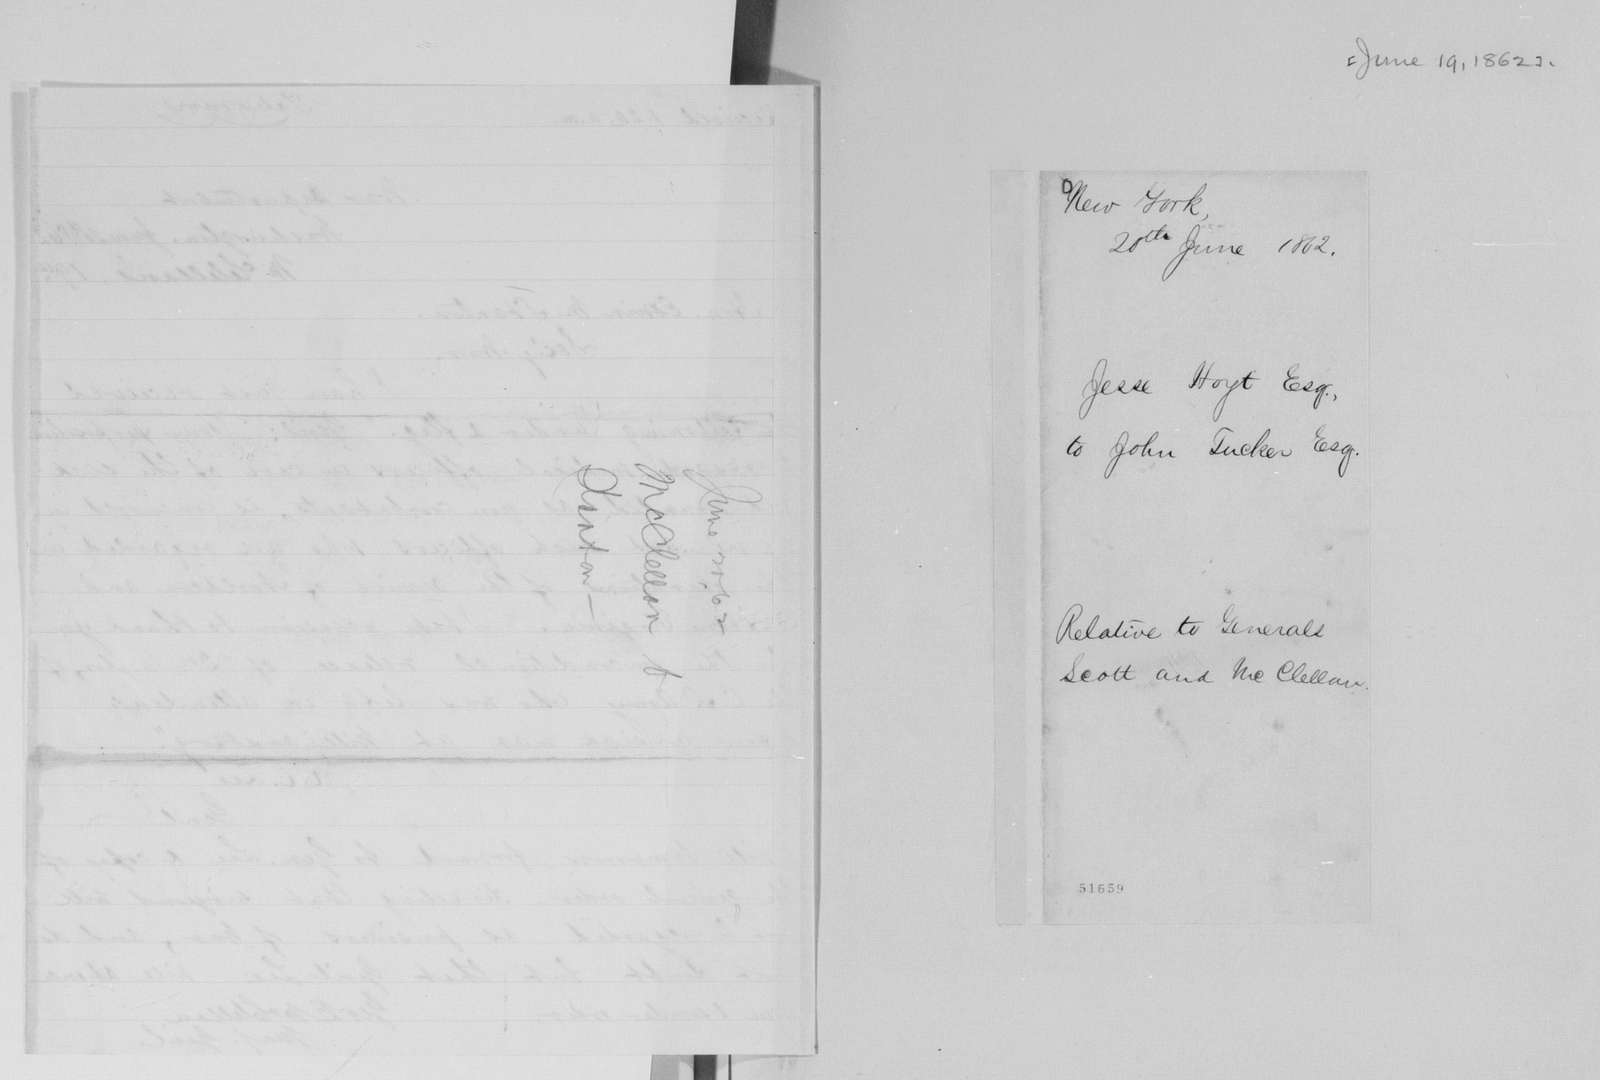 Edwin McMasters Stanton Papers: Correspondence, 1831-1870; 1862; 1862, June 19-Aug. 28